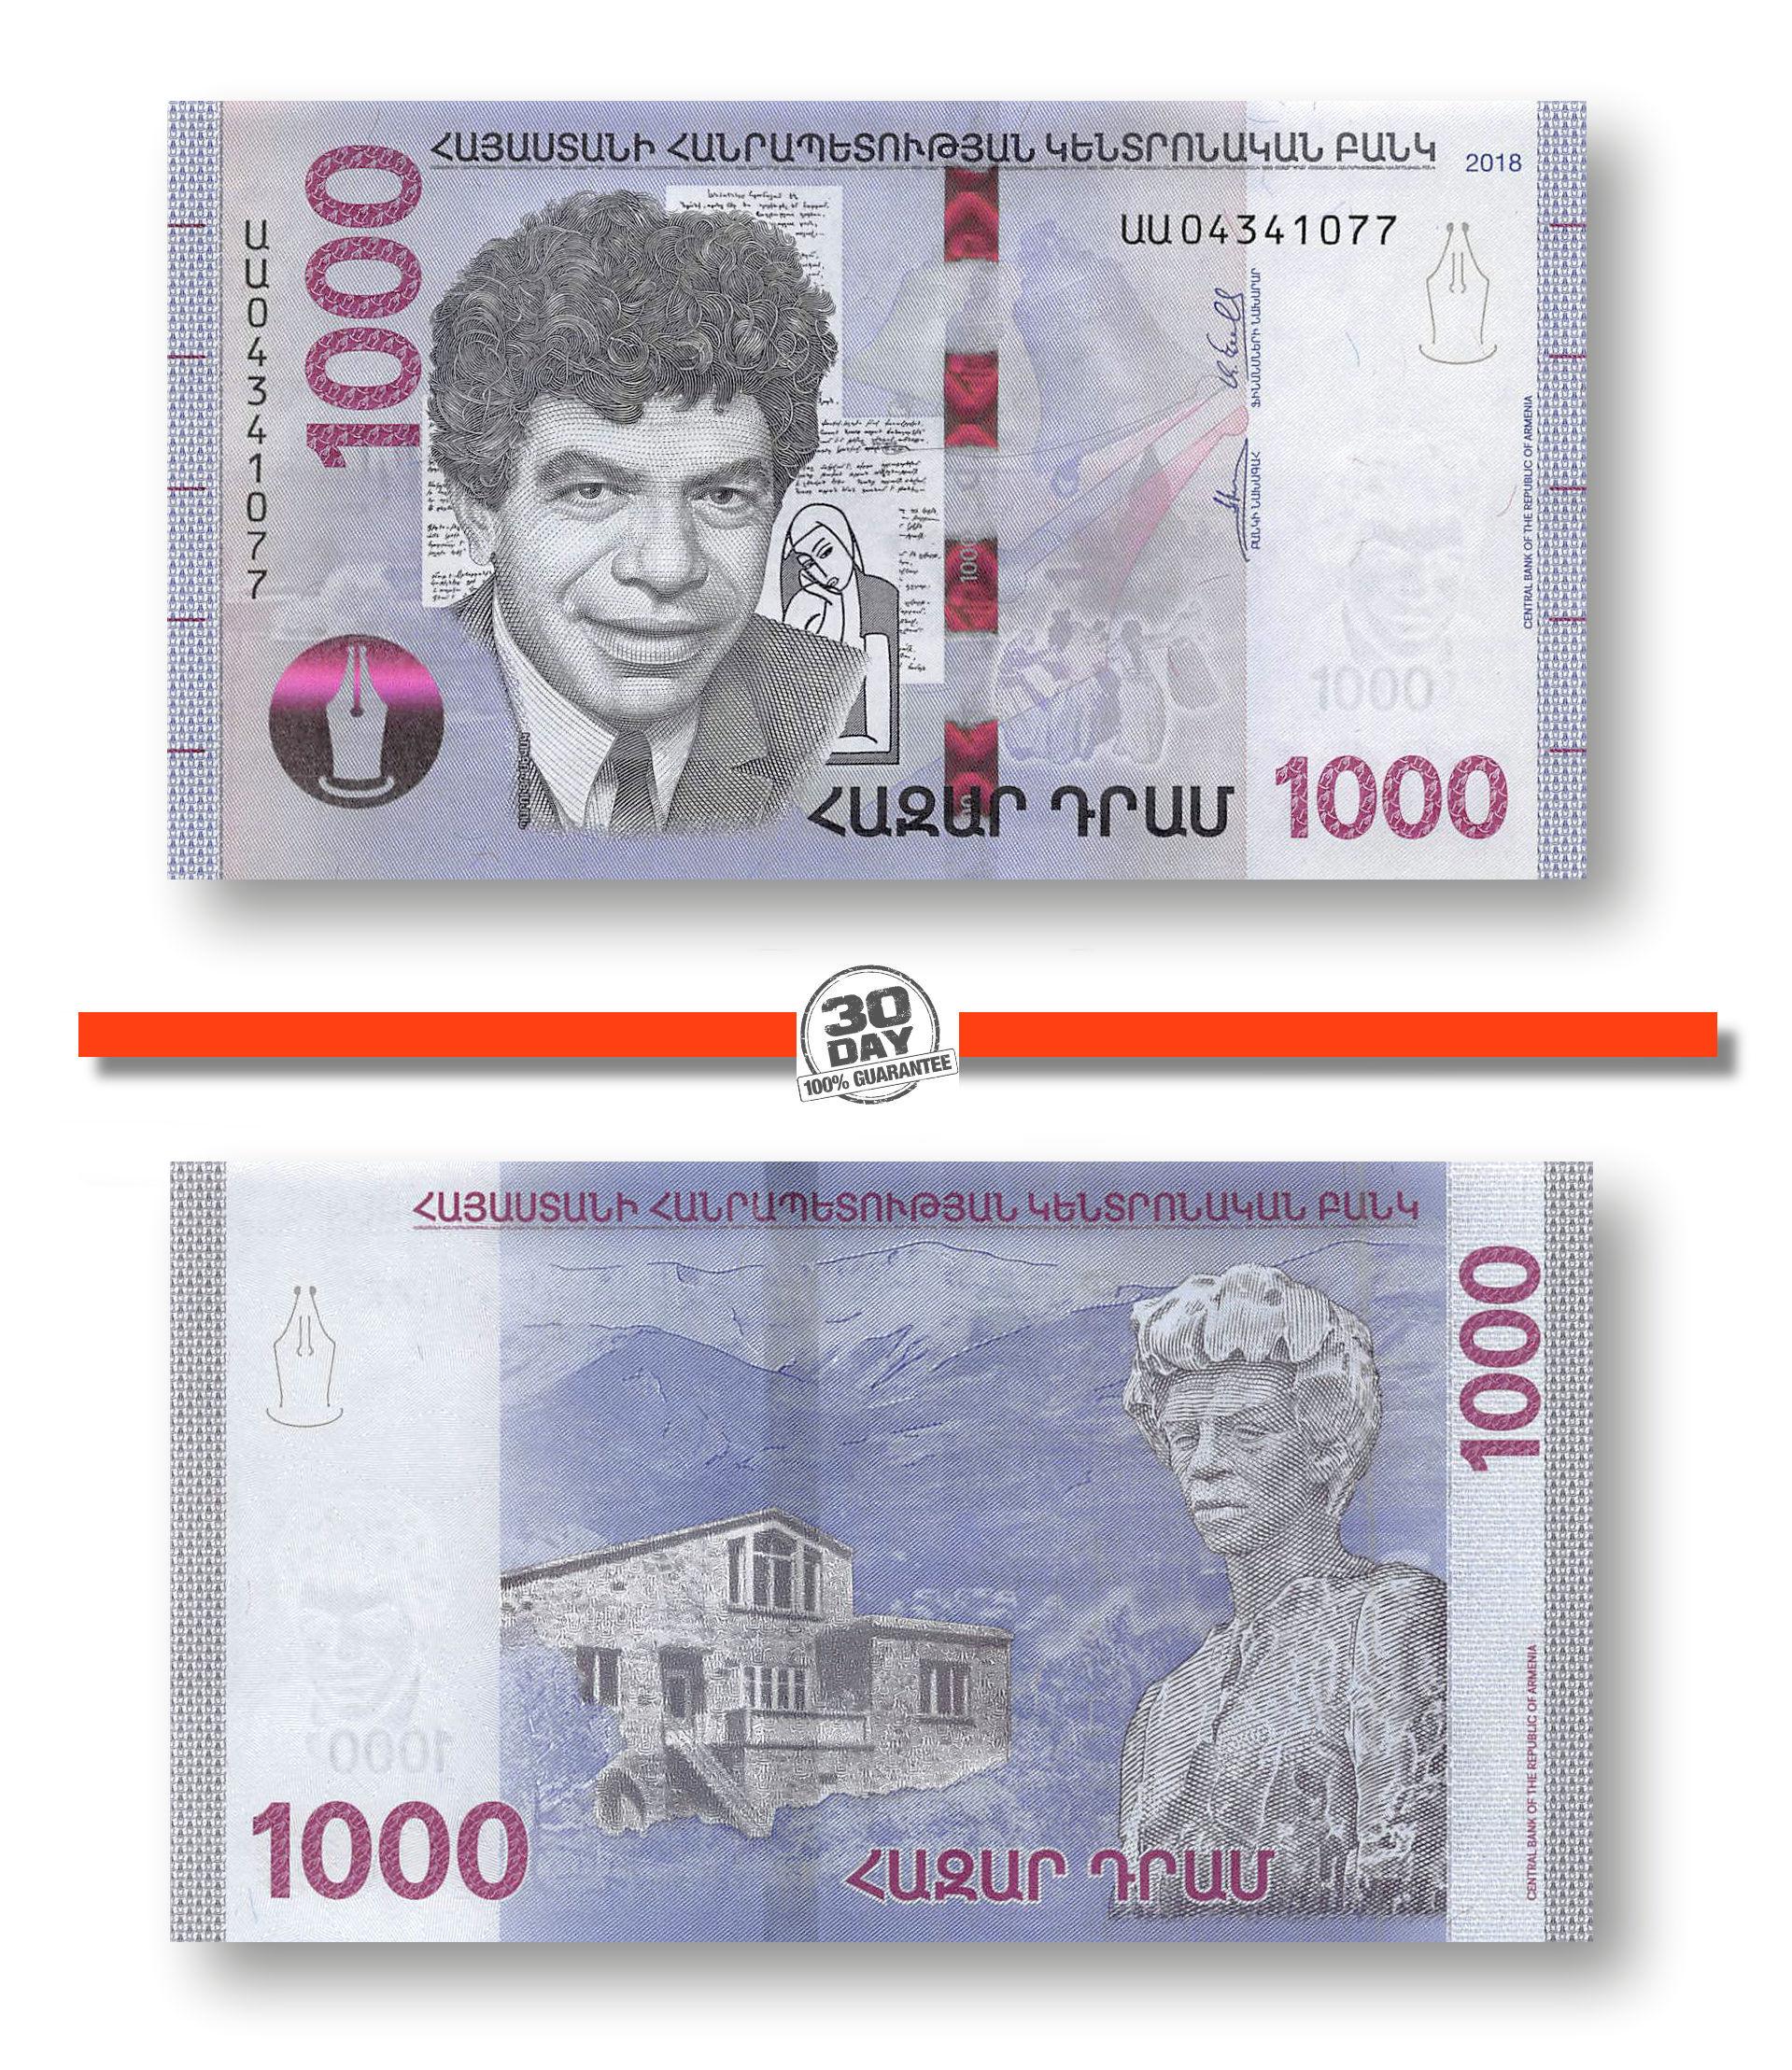 NEW Armenia 10000 dram 2018 Armenian Banknote UNC!!!